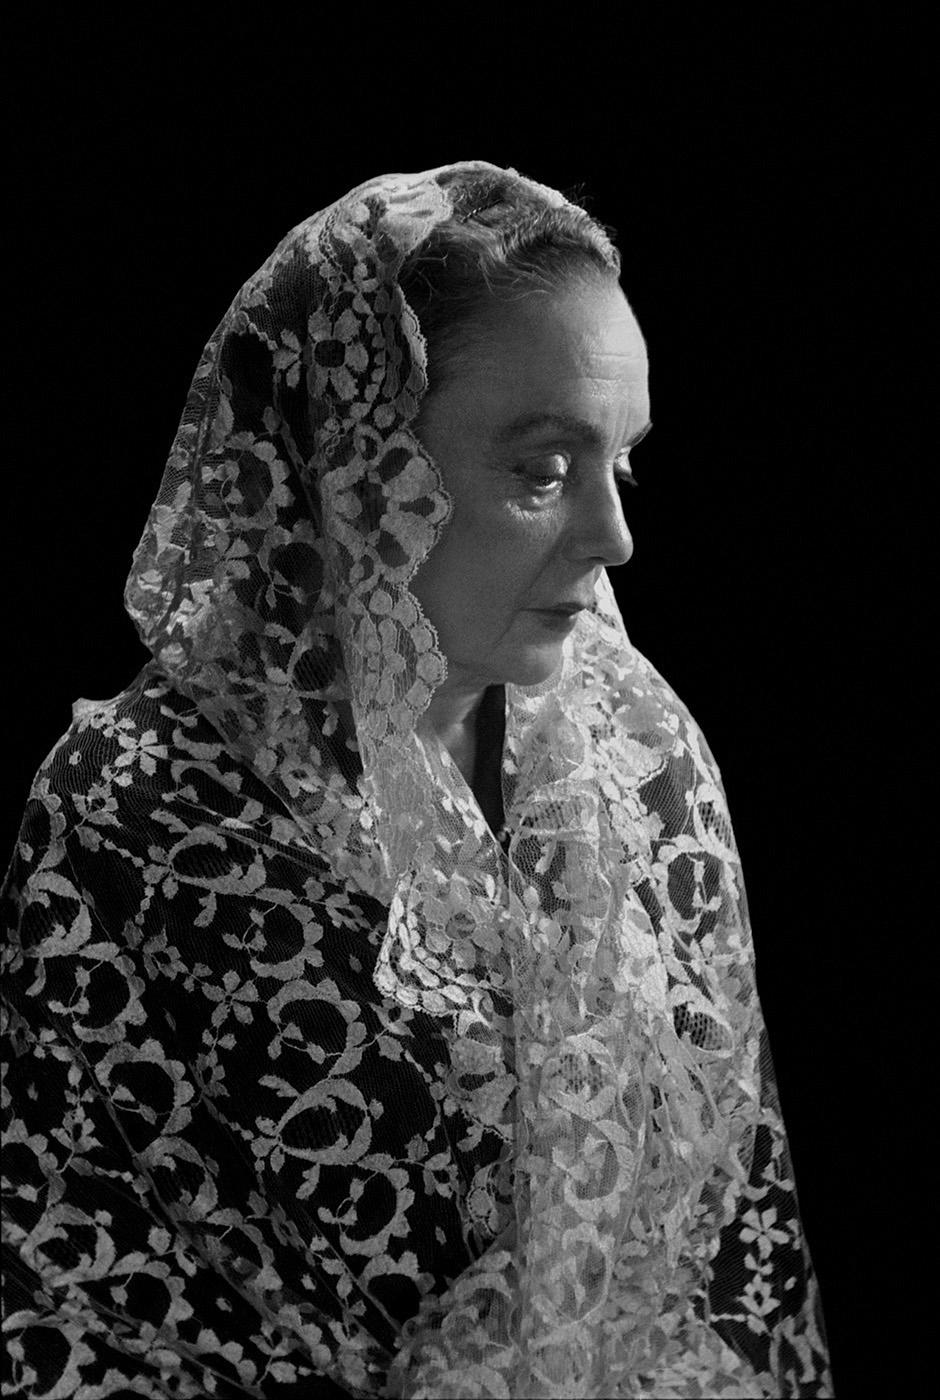 Sra. De Alvarez, Mexico, 1953